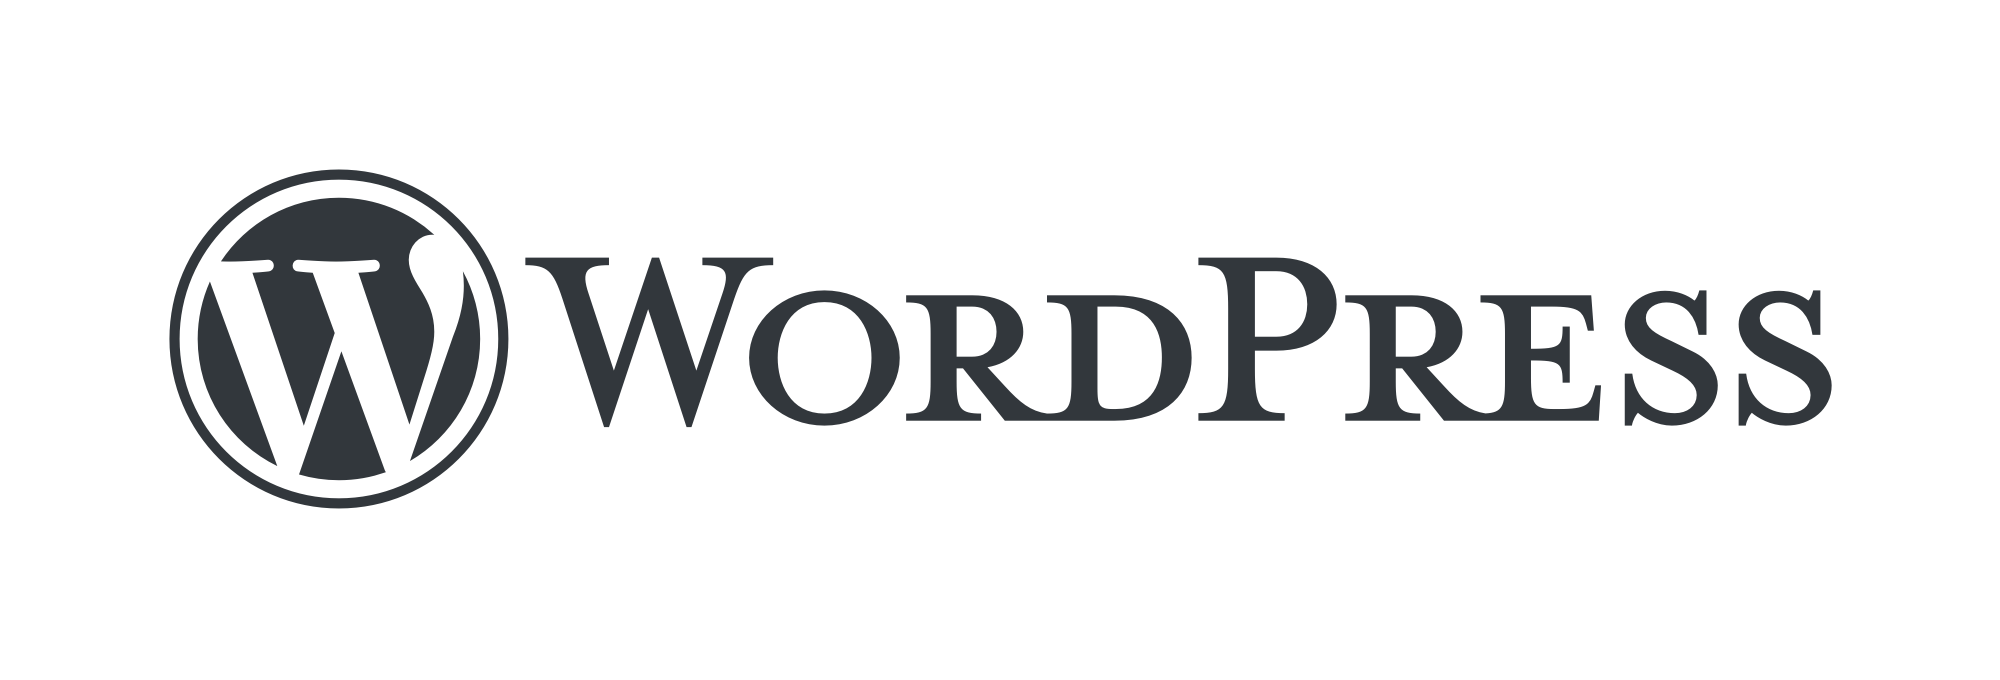 WordPress-logotype-standard copy 2